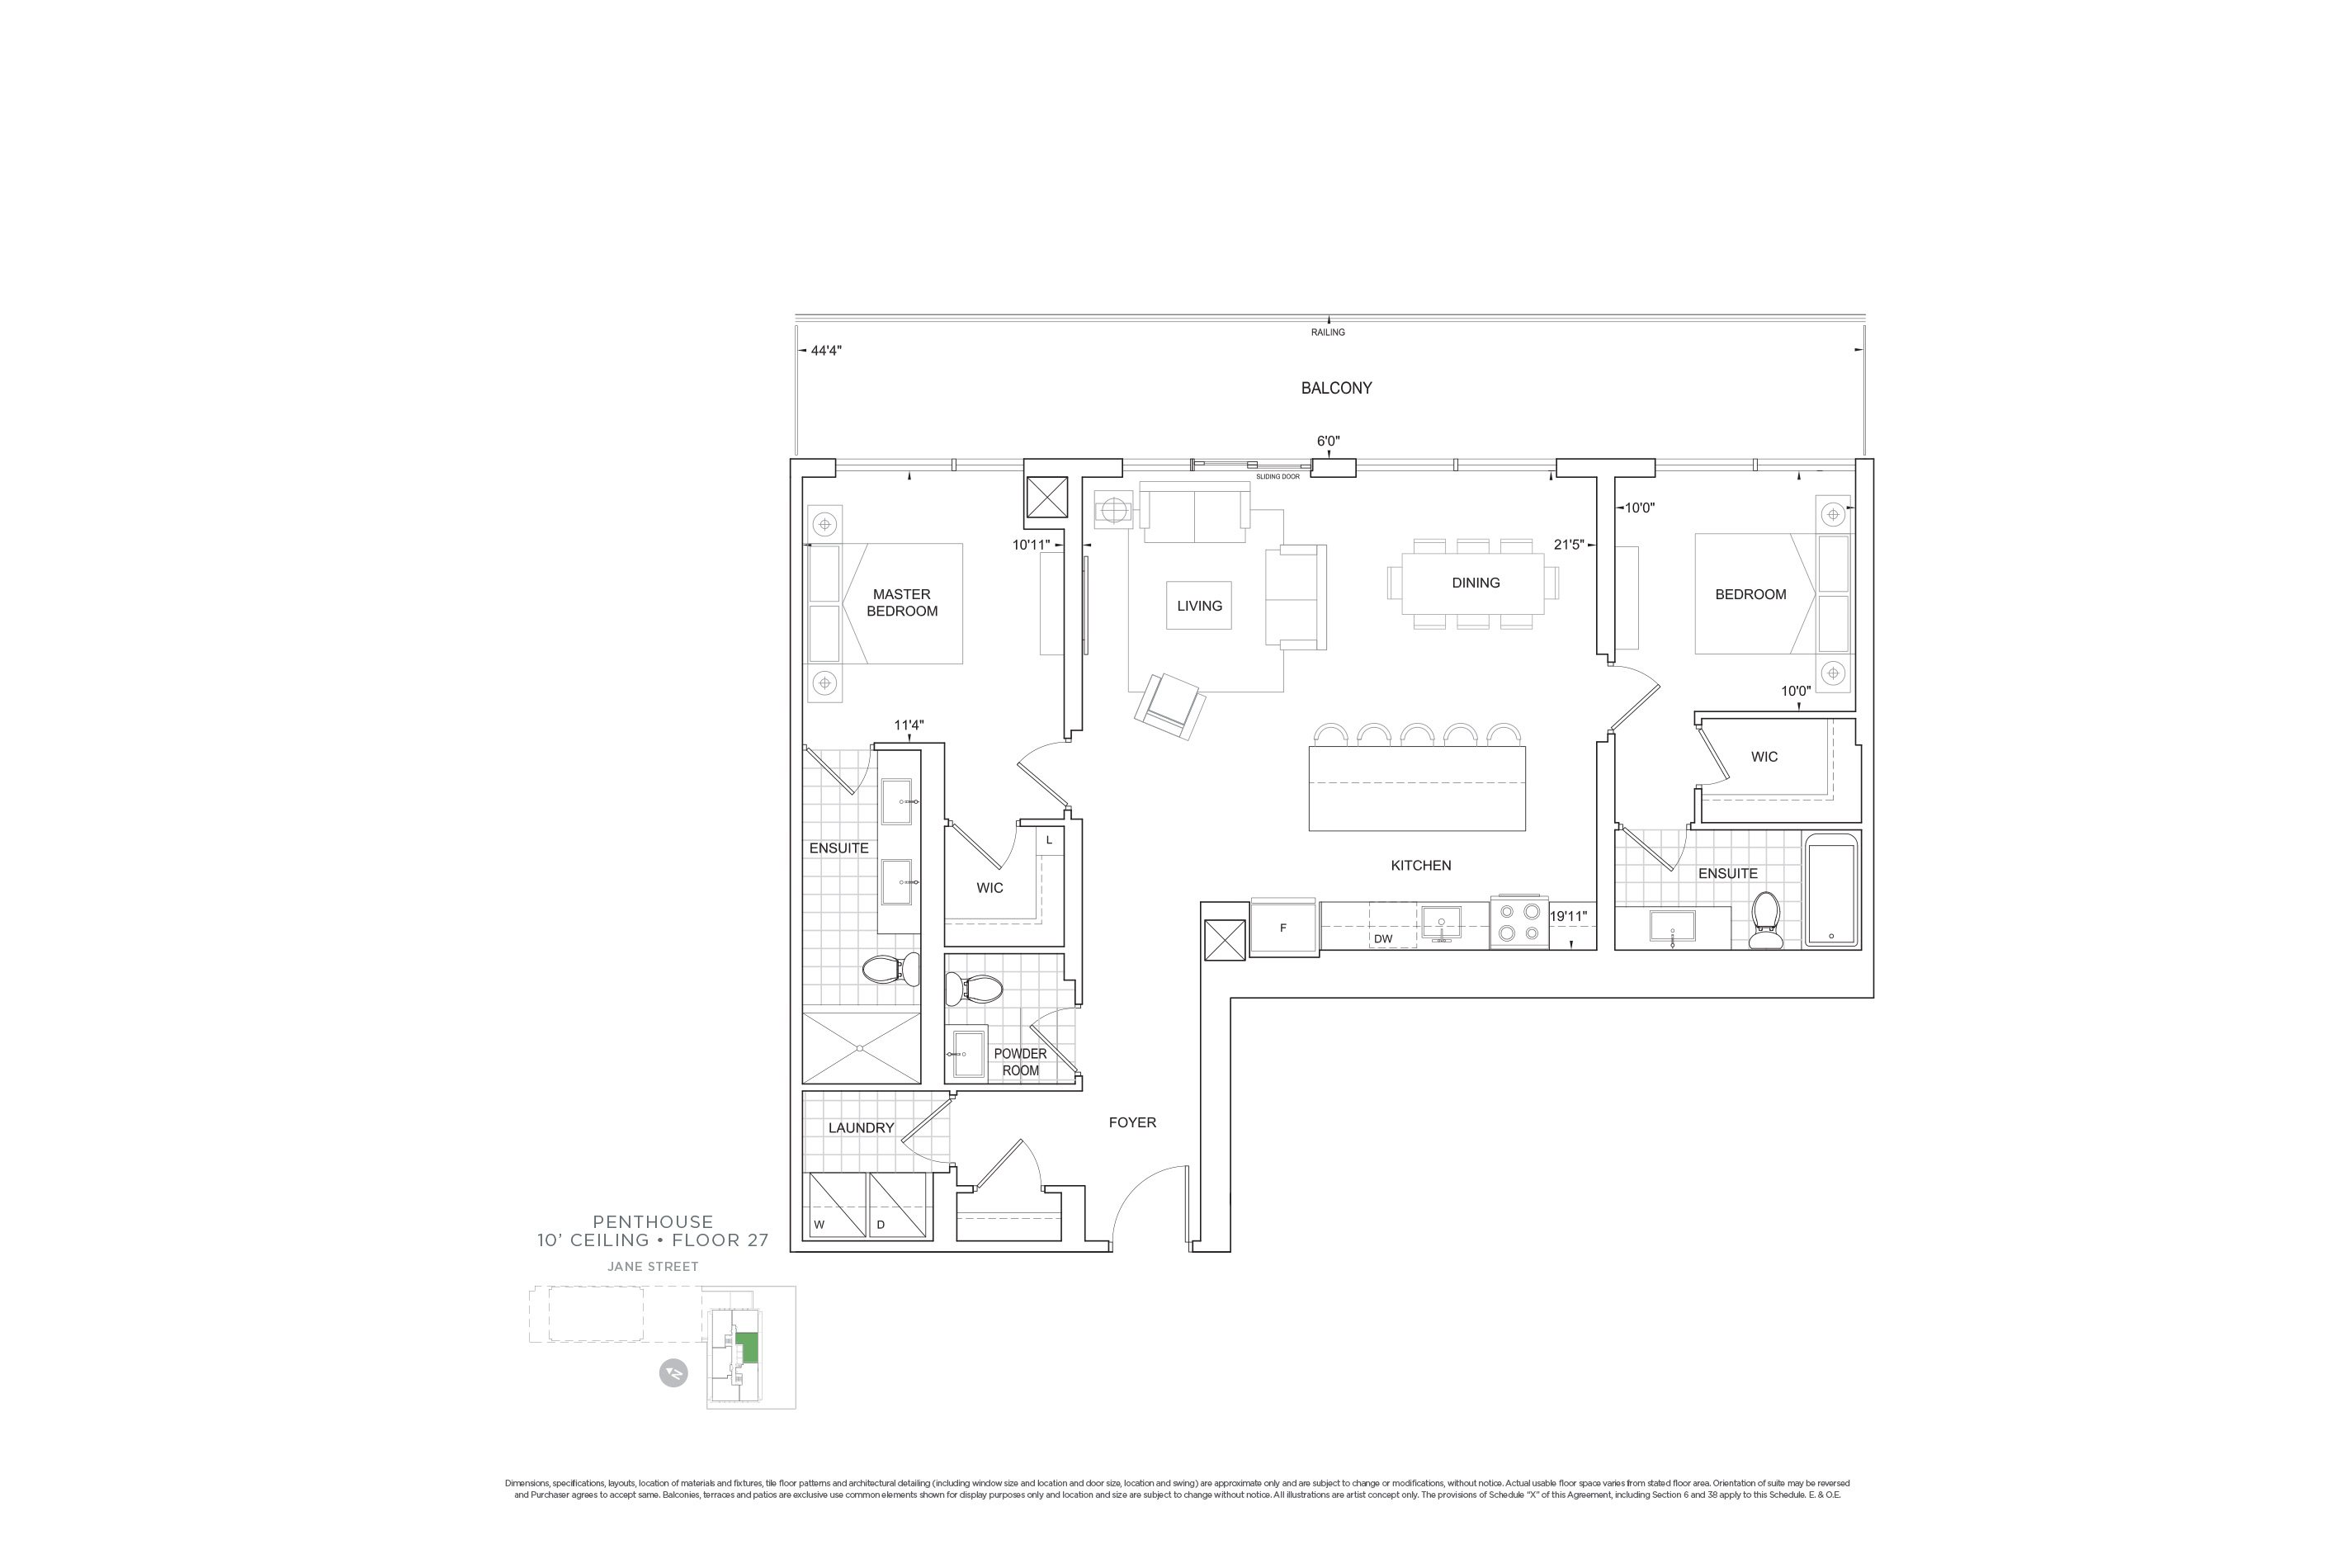 C1204 Penthouse Units